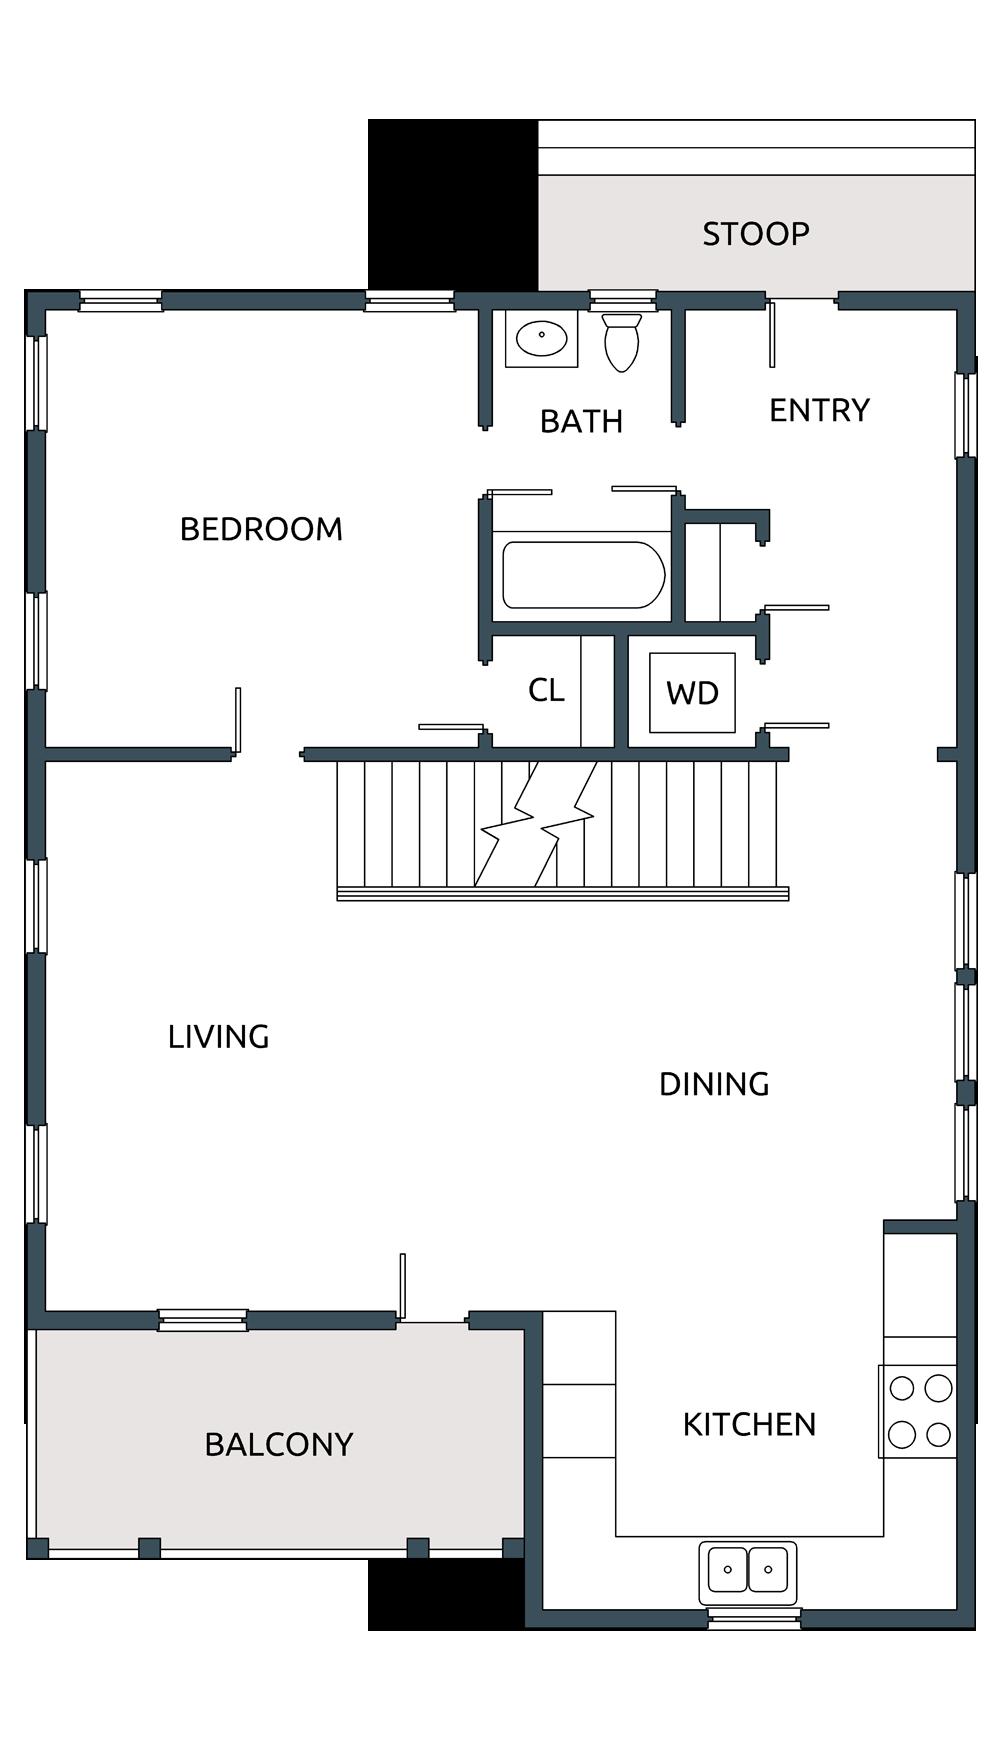 charming home floorplans 4 legasea beach home 2nd charming home floorplans 4 legasea beach home 2nd floor081816012351 png